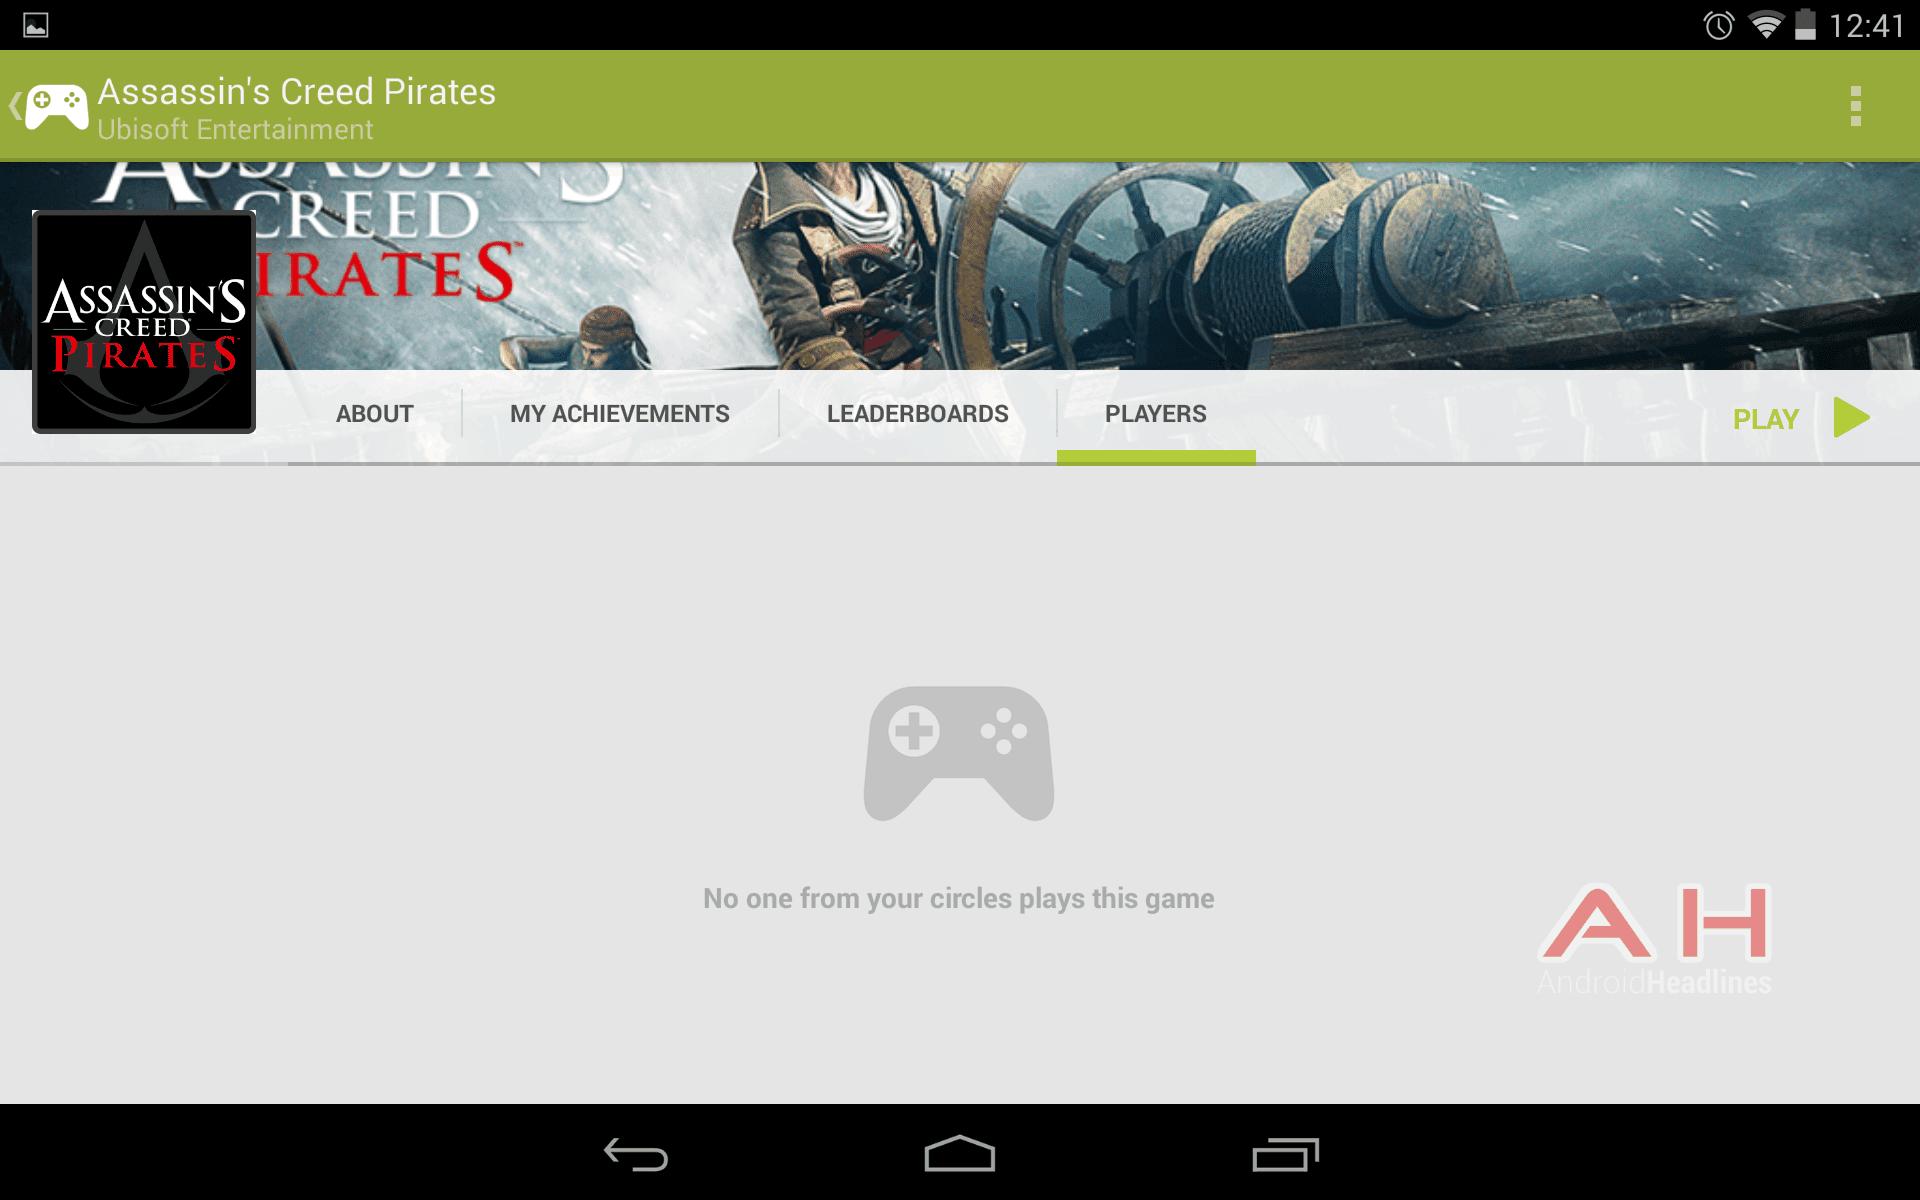 Screenshot 2014 03 05 12 41 20